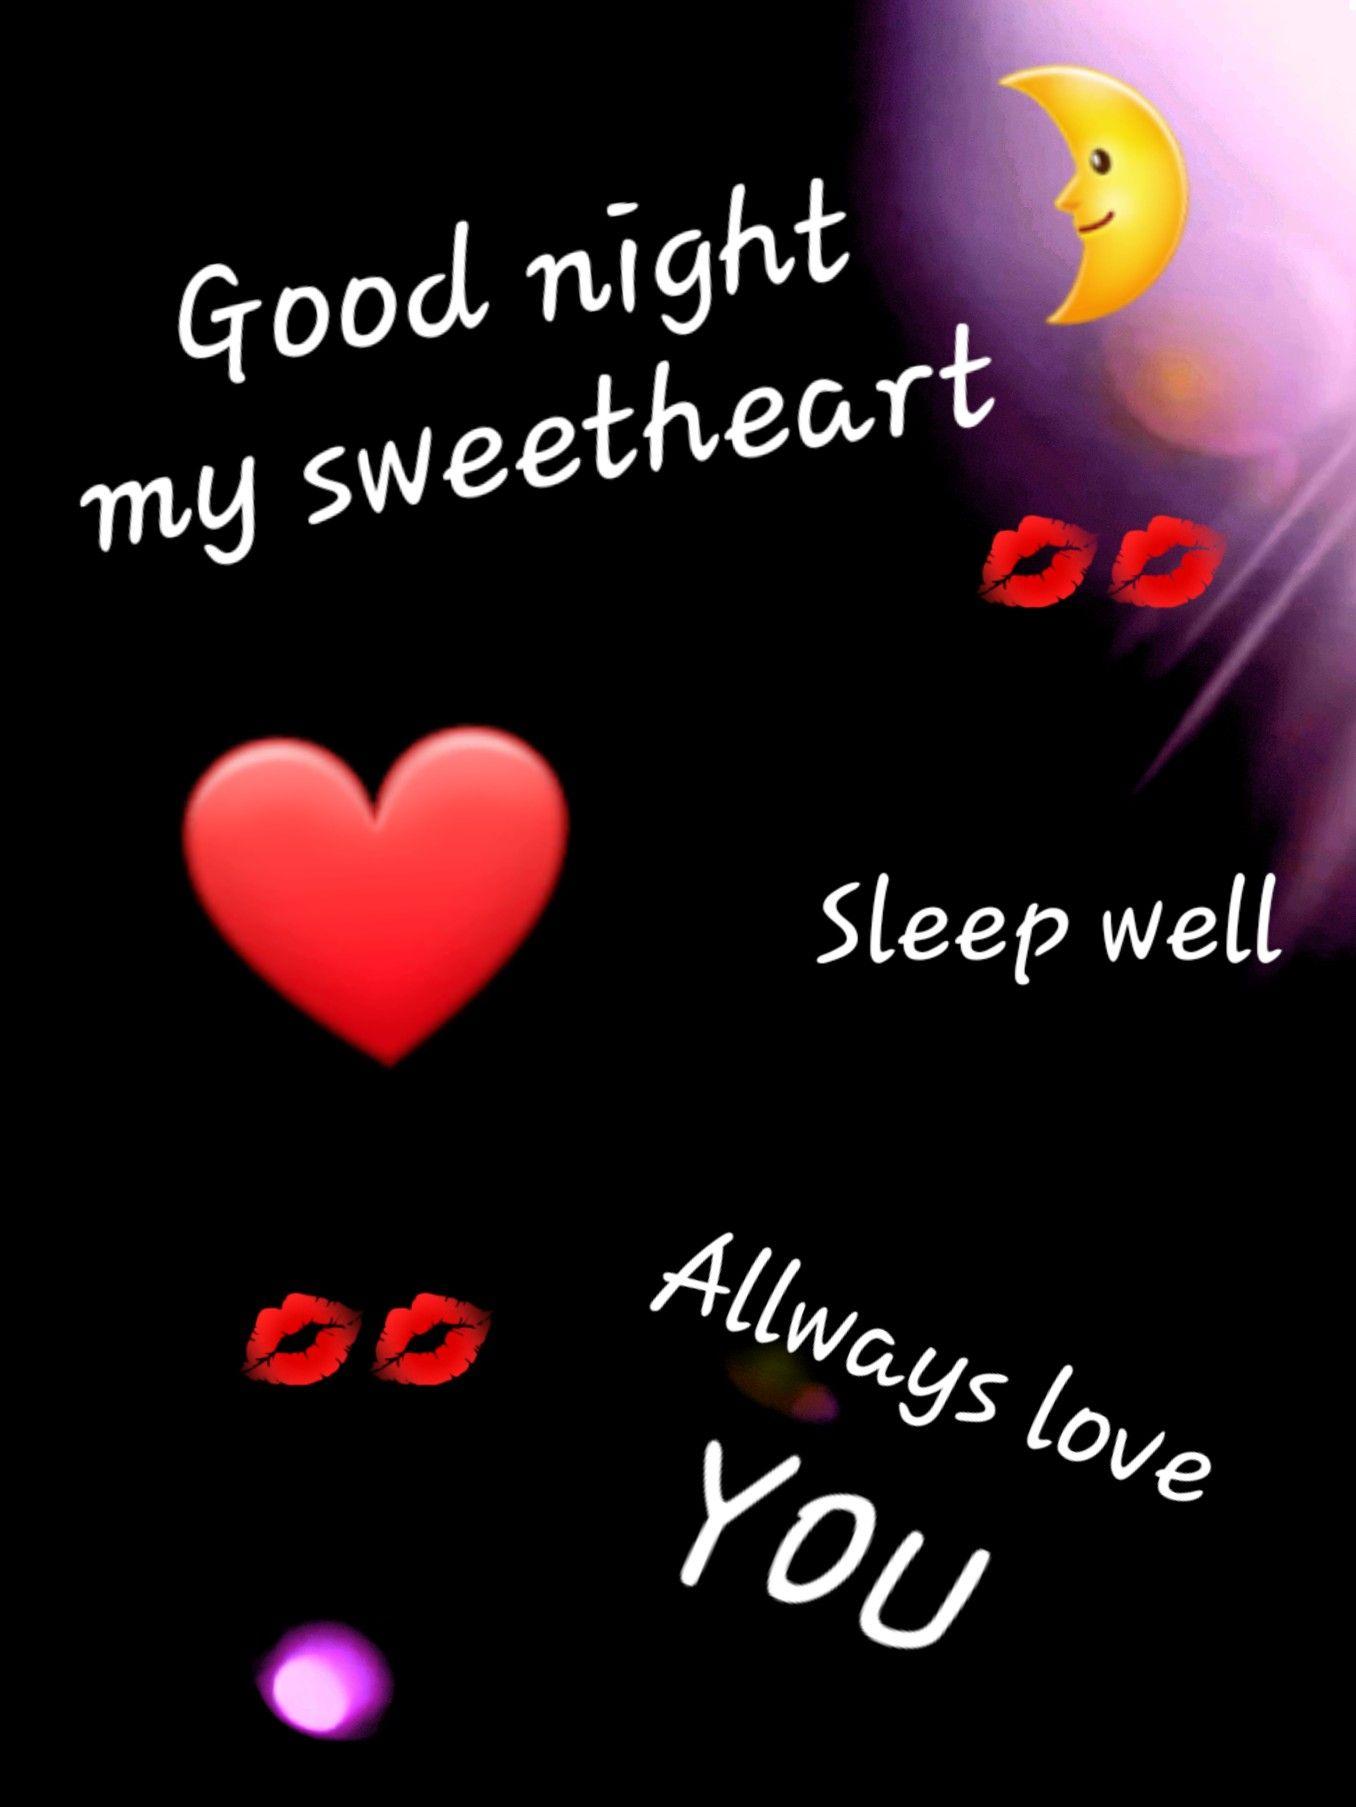 Pin By Subithaelena Elena On Good Night Good Night Love You Good Night Love Images Good Night Sweet Dreams